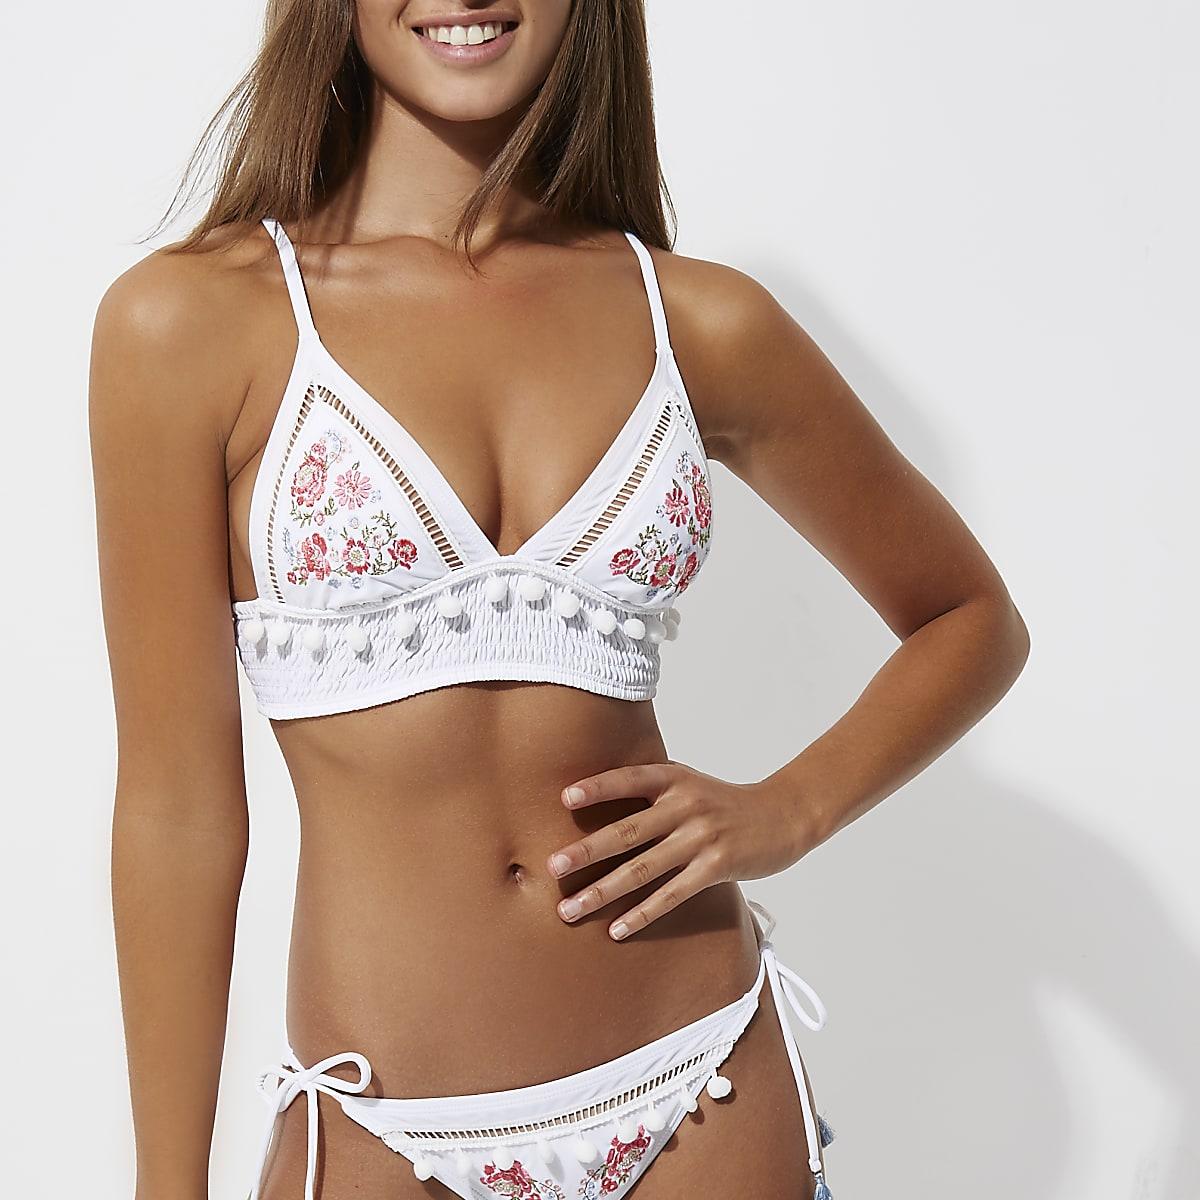 ffec34c90fe White floral triangle longline bikini top - Bikini Tops - Bikinis - Swimwear  & Beachwear - women